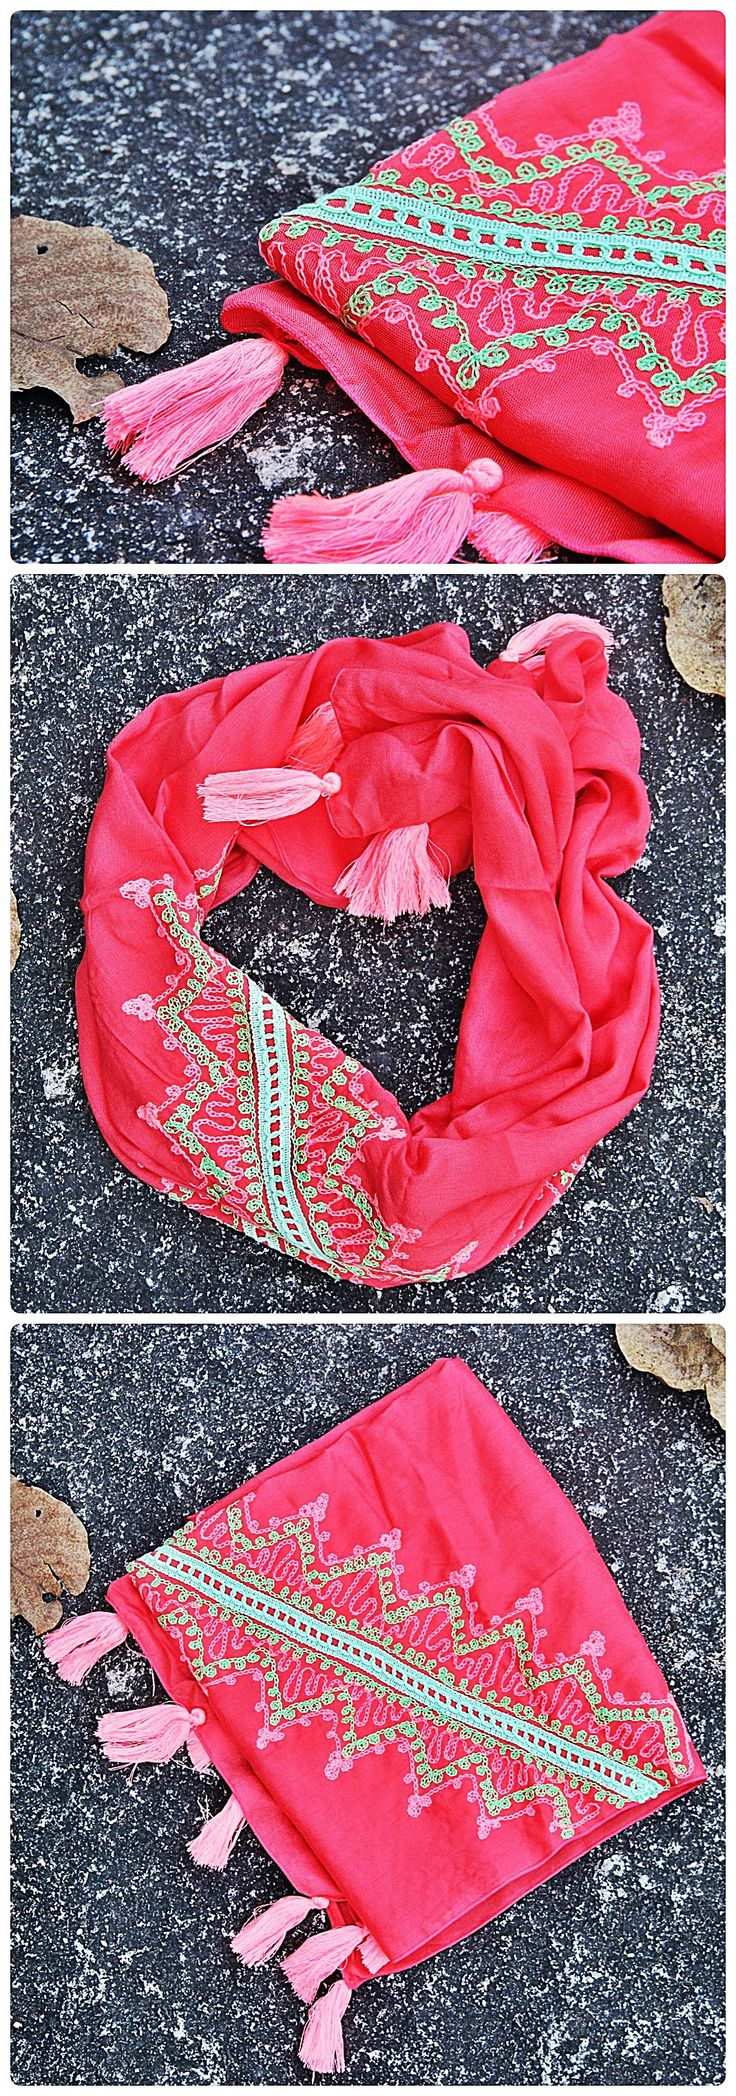 Pañuelos Bordados - Bali Indonesia  $ 8.990  Código: V040 - Rojo  Medidas: 48 x 175 cm.